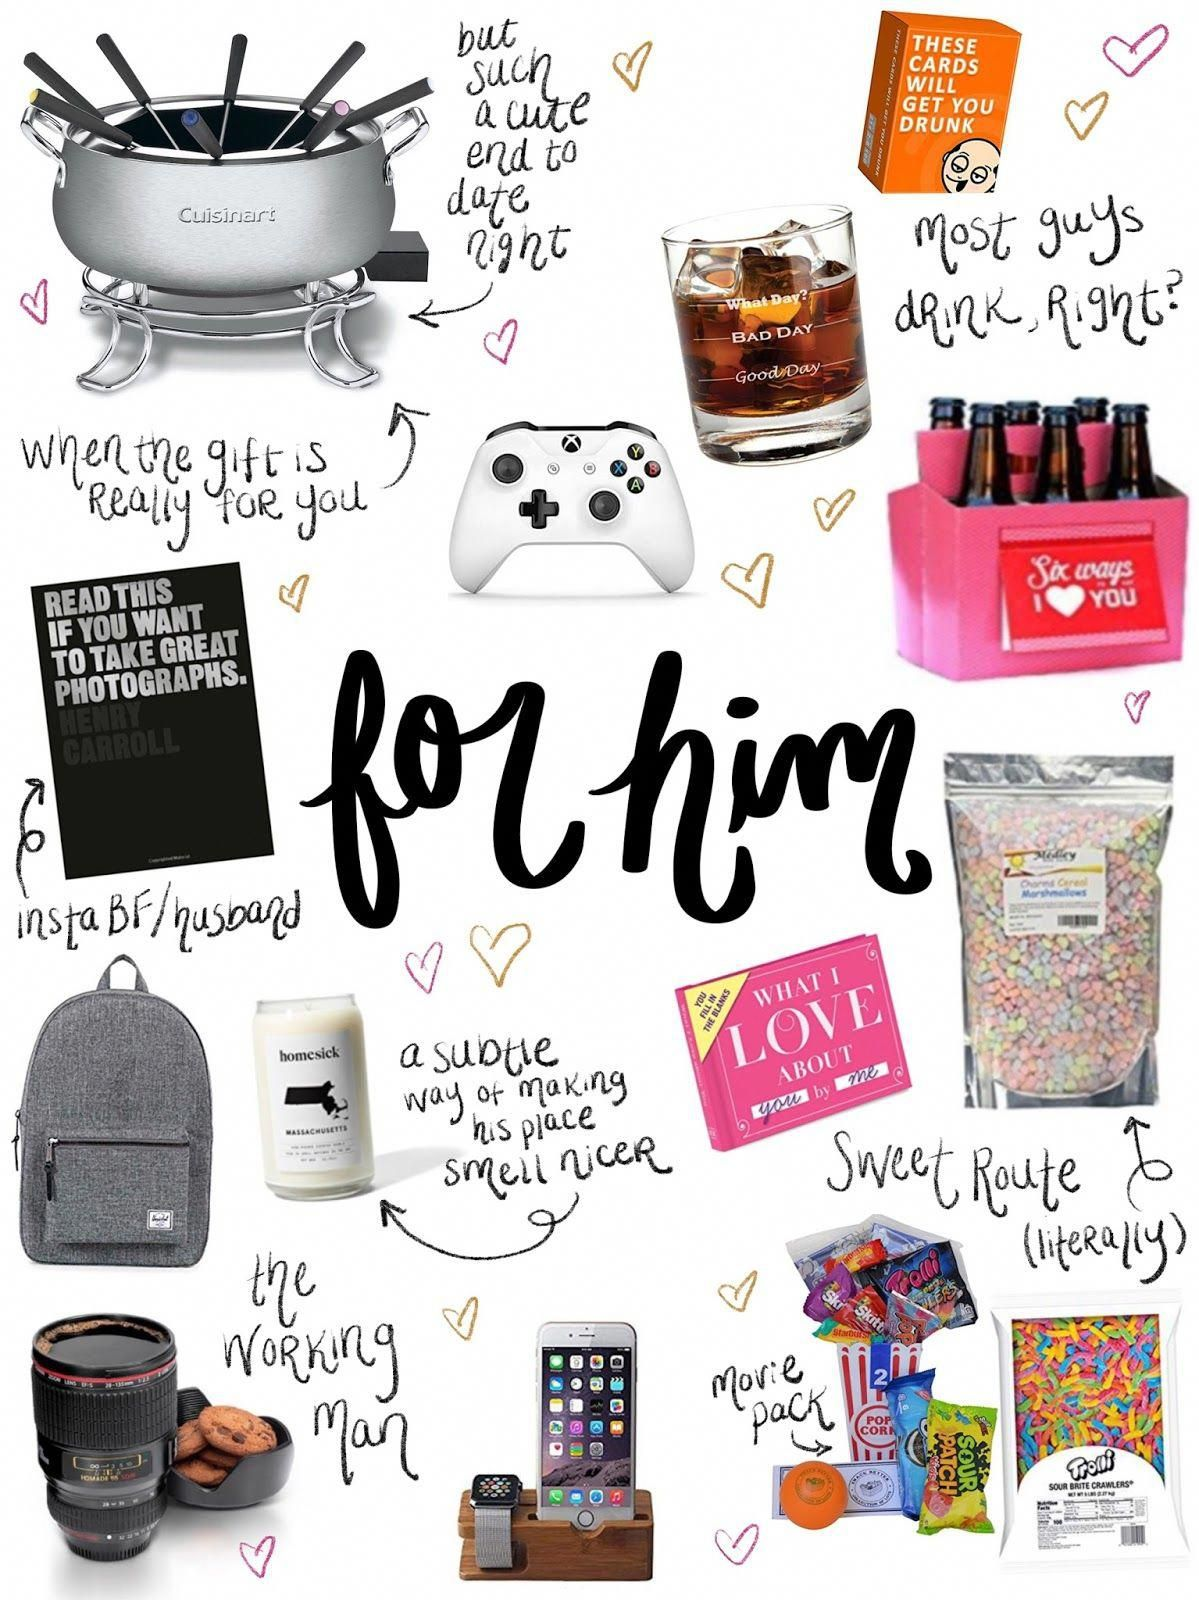 Valentine S Day Amazon Prime Under 50 For Him Gift Guide Boyfriend Surprisegiftsforhim Romantic Gifts For Him Valentines Gift Guide Surprise Gifts For Him